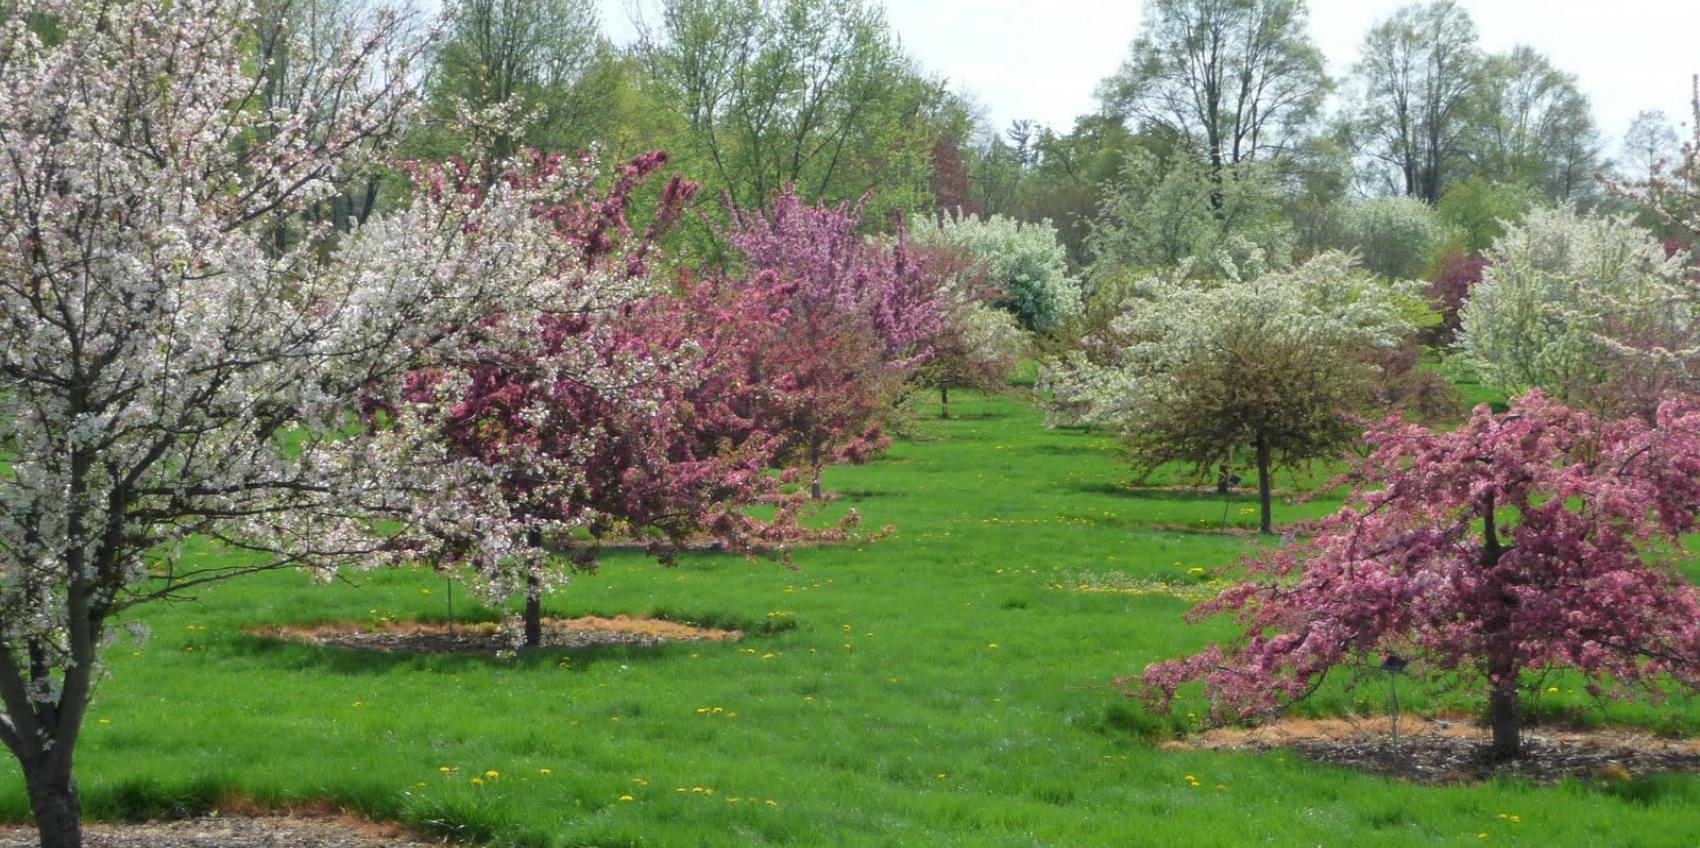 Secrest Arboretum Oardc American Public Gardens Association